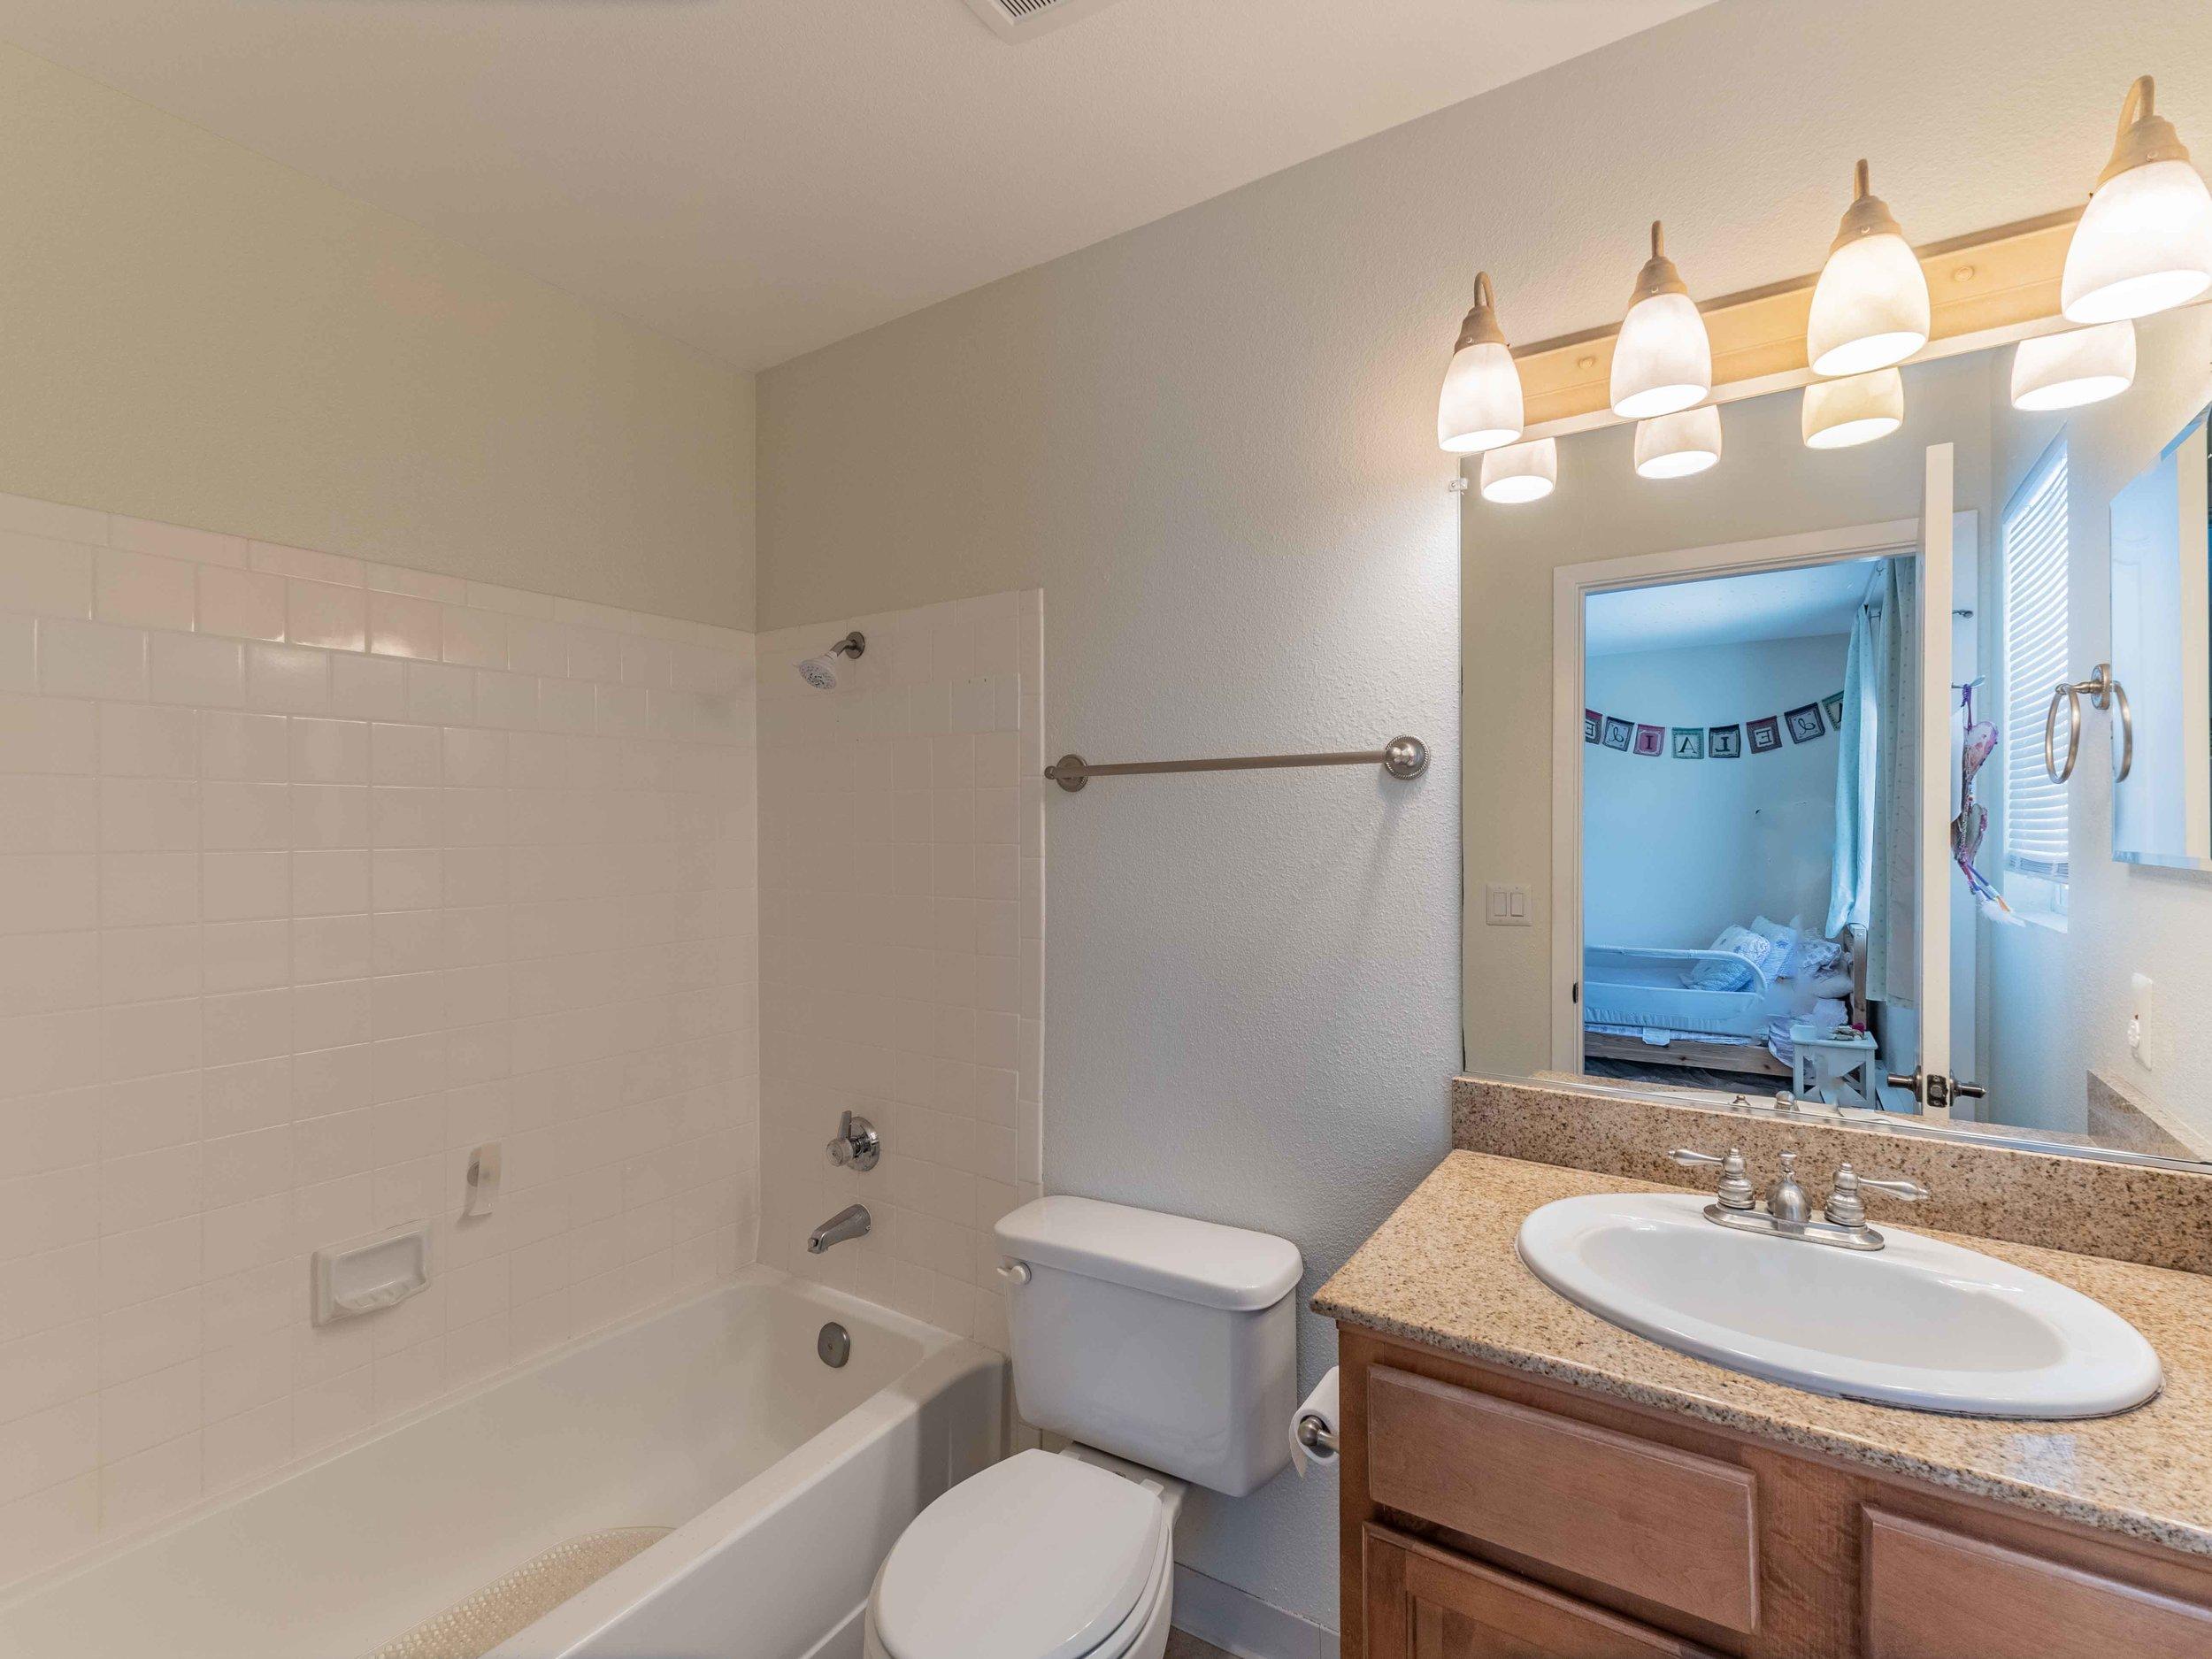 Bathroom with tub and shower Santa Cruz